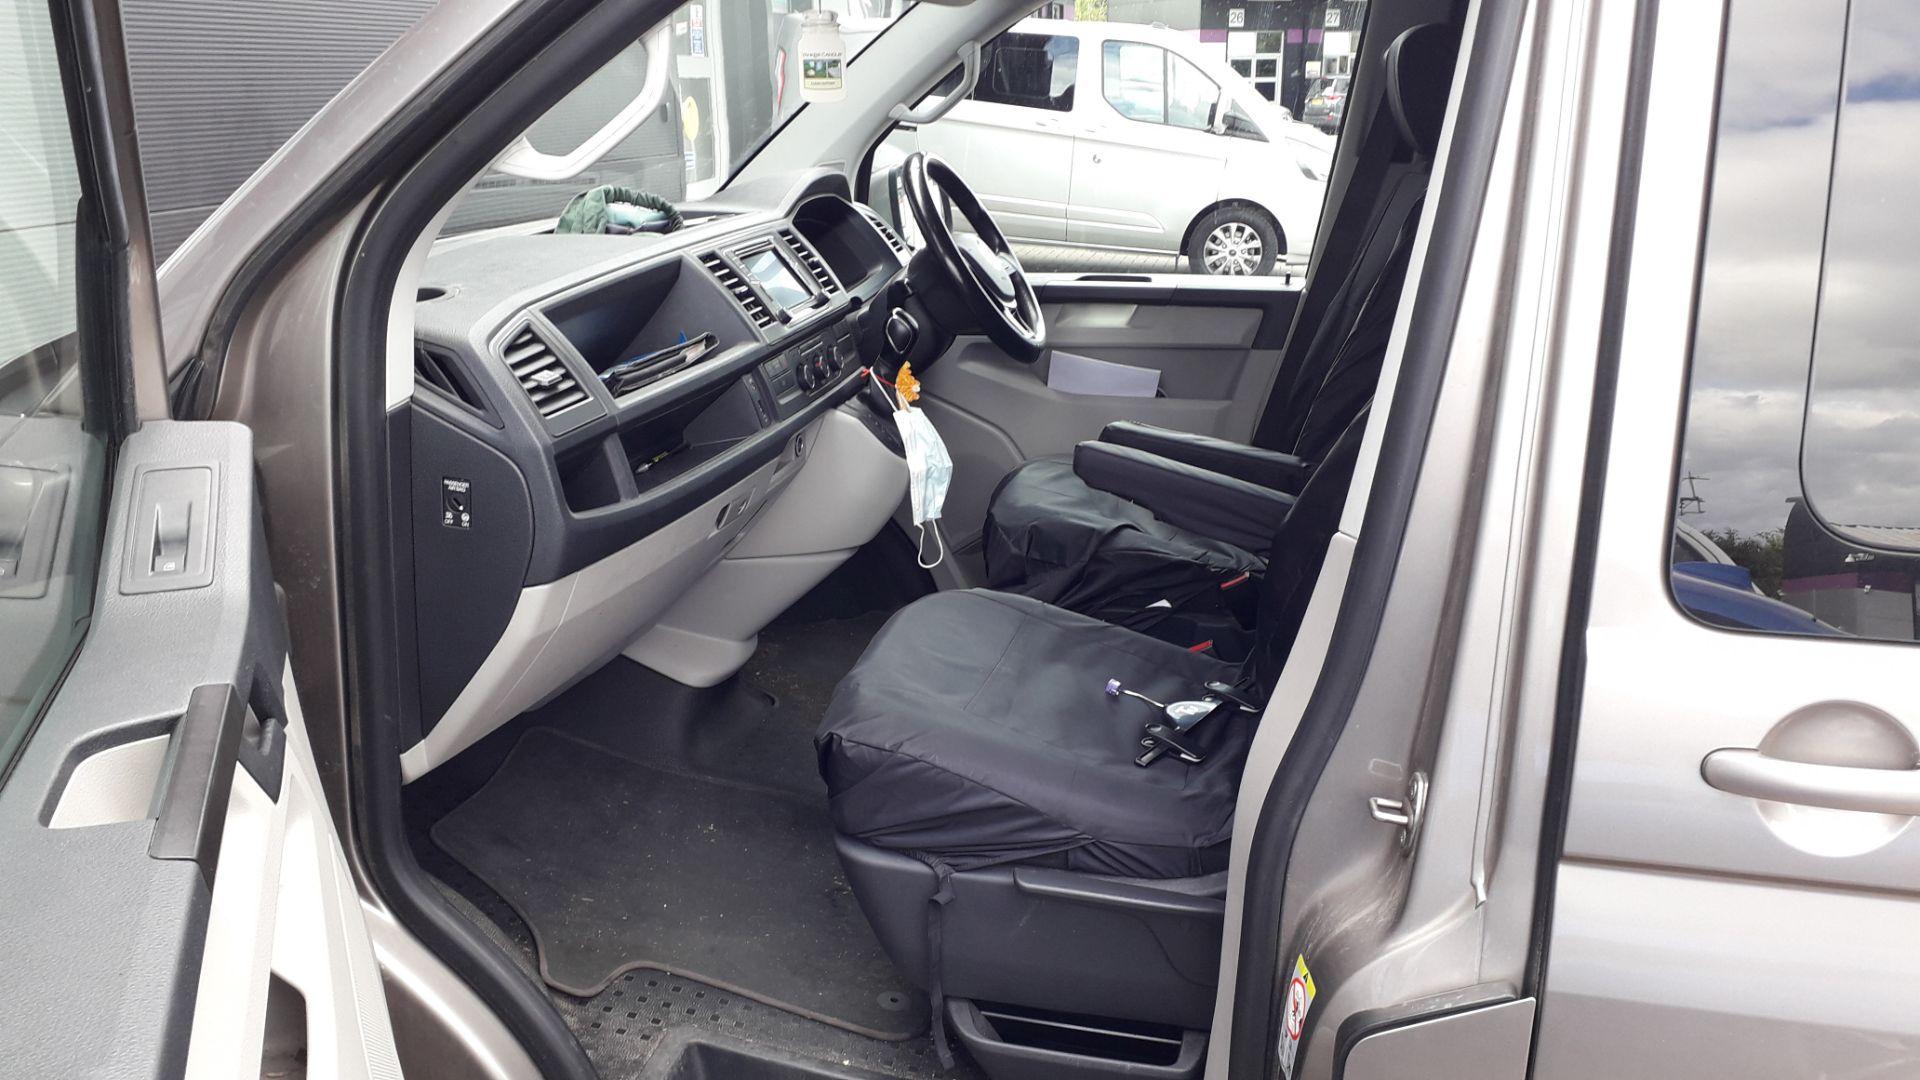 Volkswagen Transporter T30 2.0 Tdi BMT 150 Highlin - Image 11 of 18